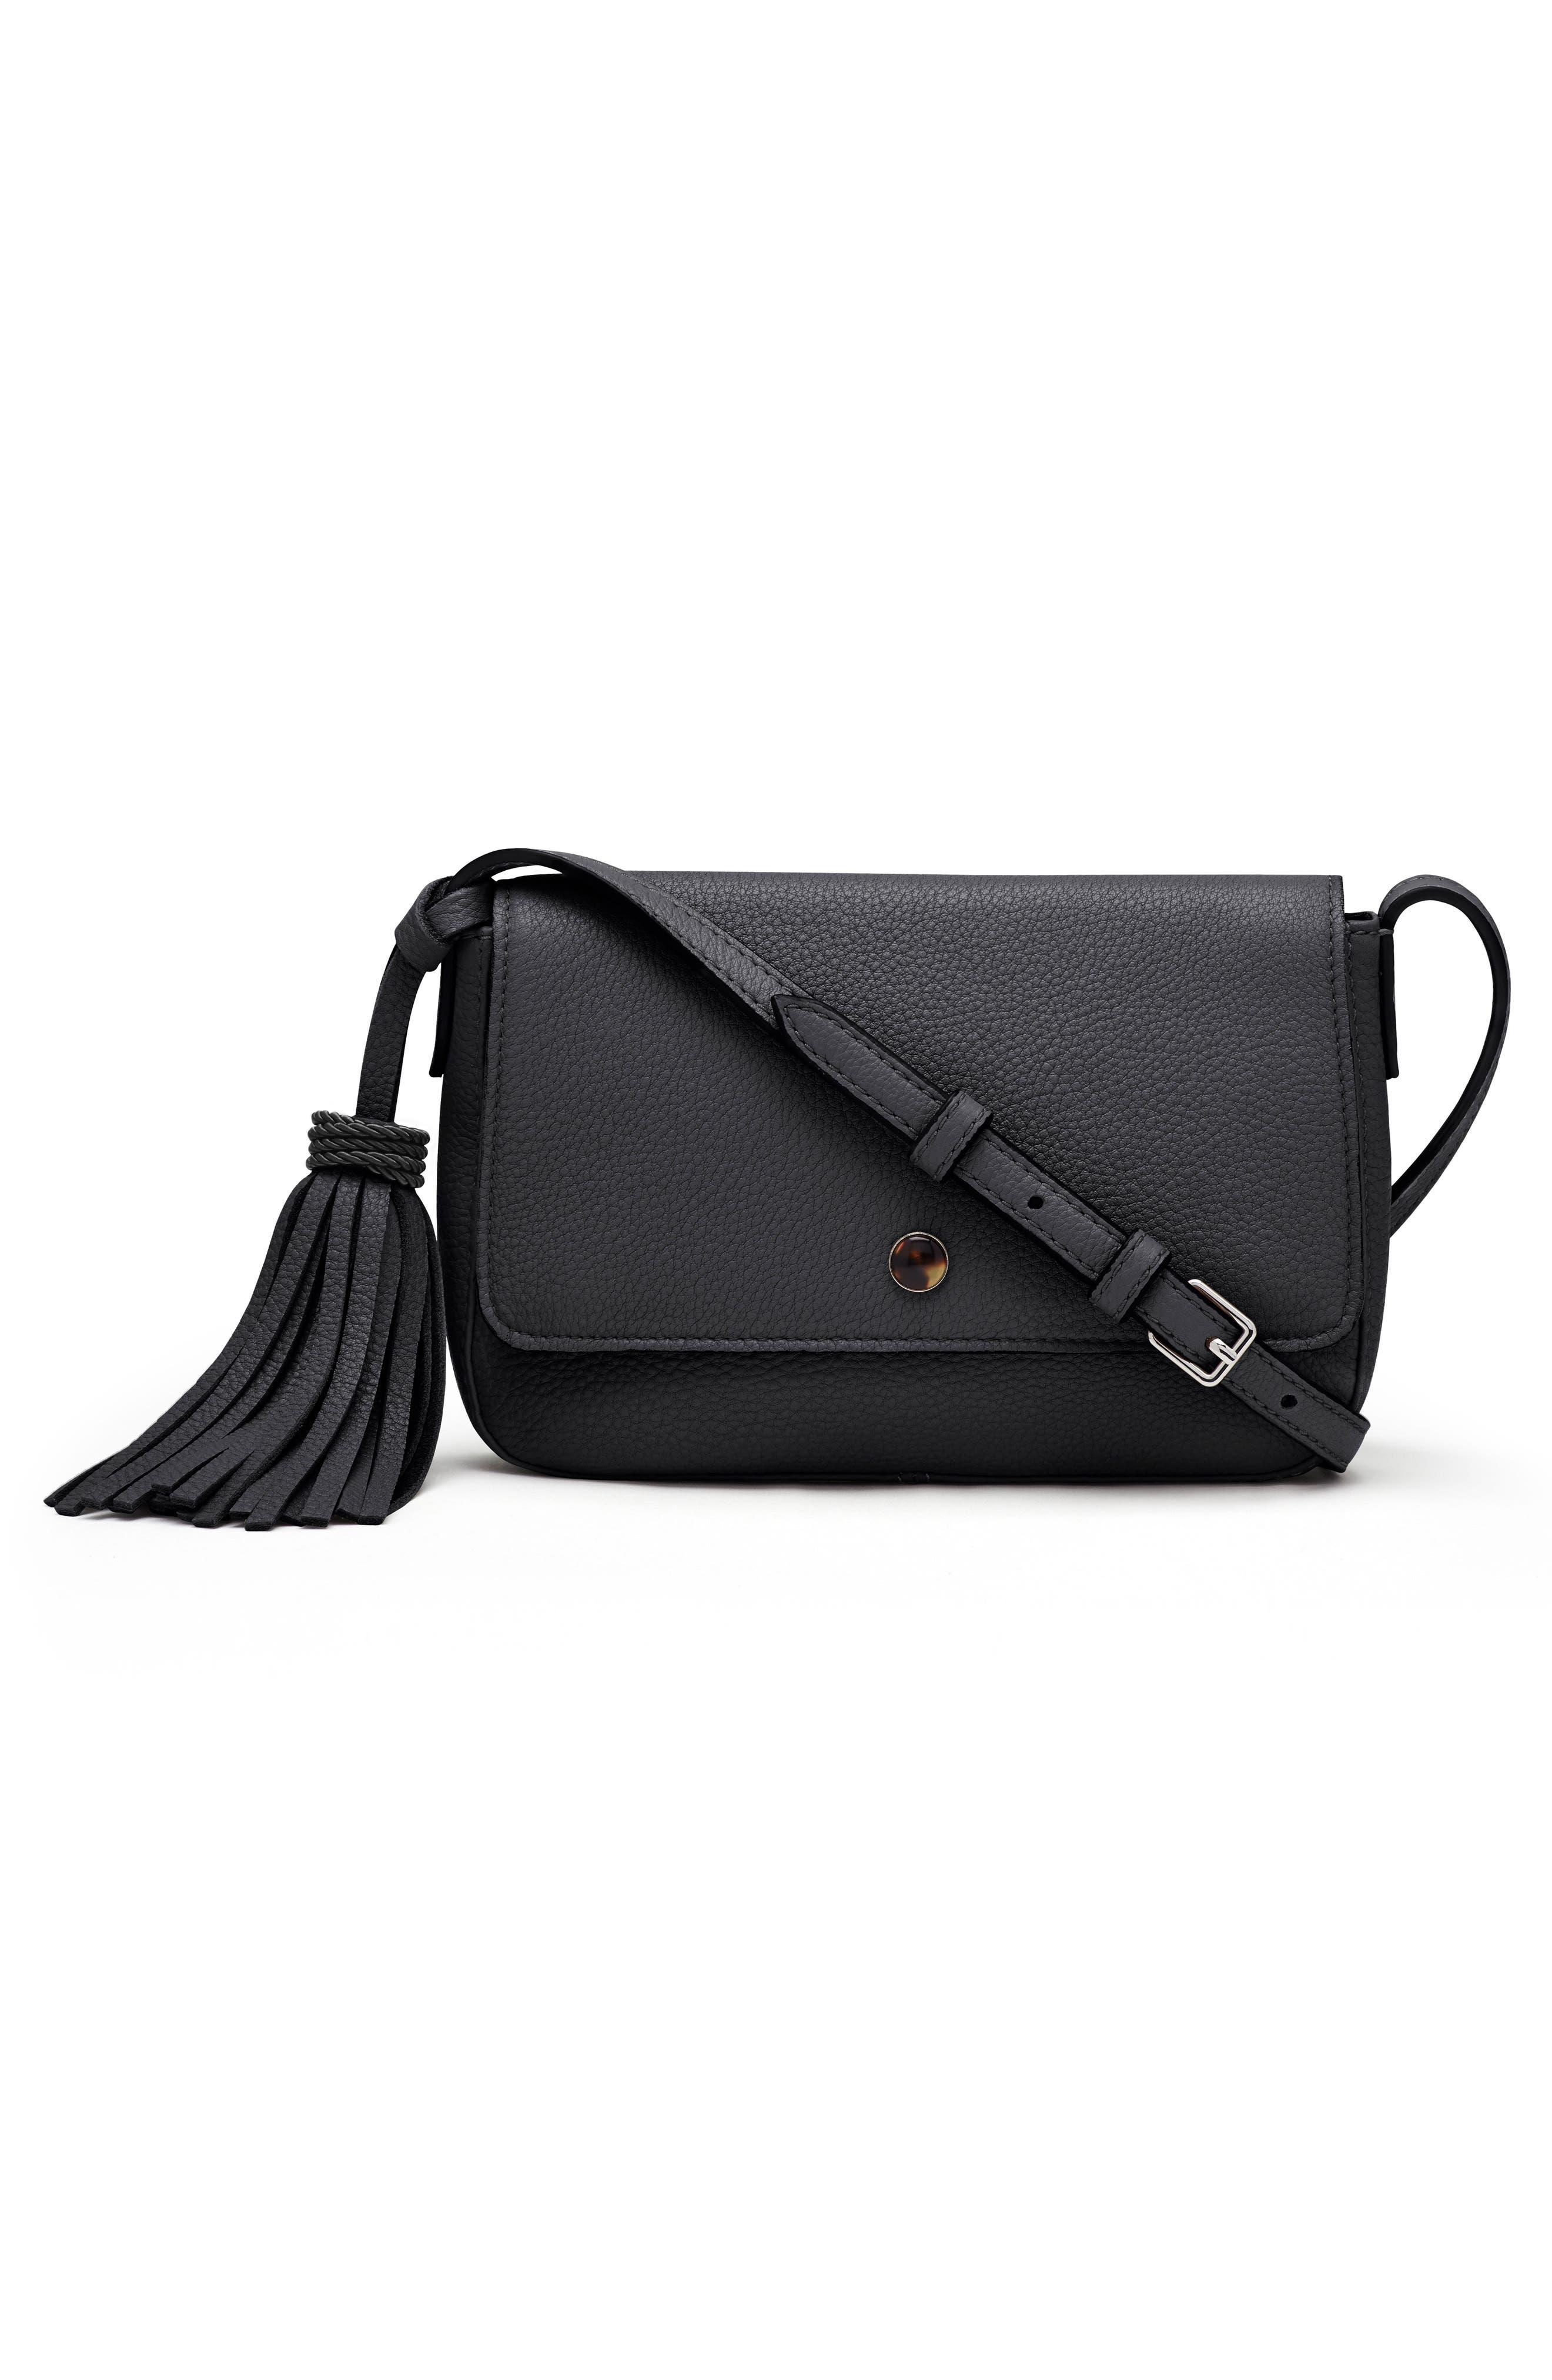 ELIZABETH AND JAMES Micro Cynnie Leather Crossbody Bag, Main, color, 001